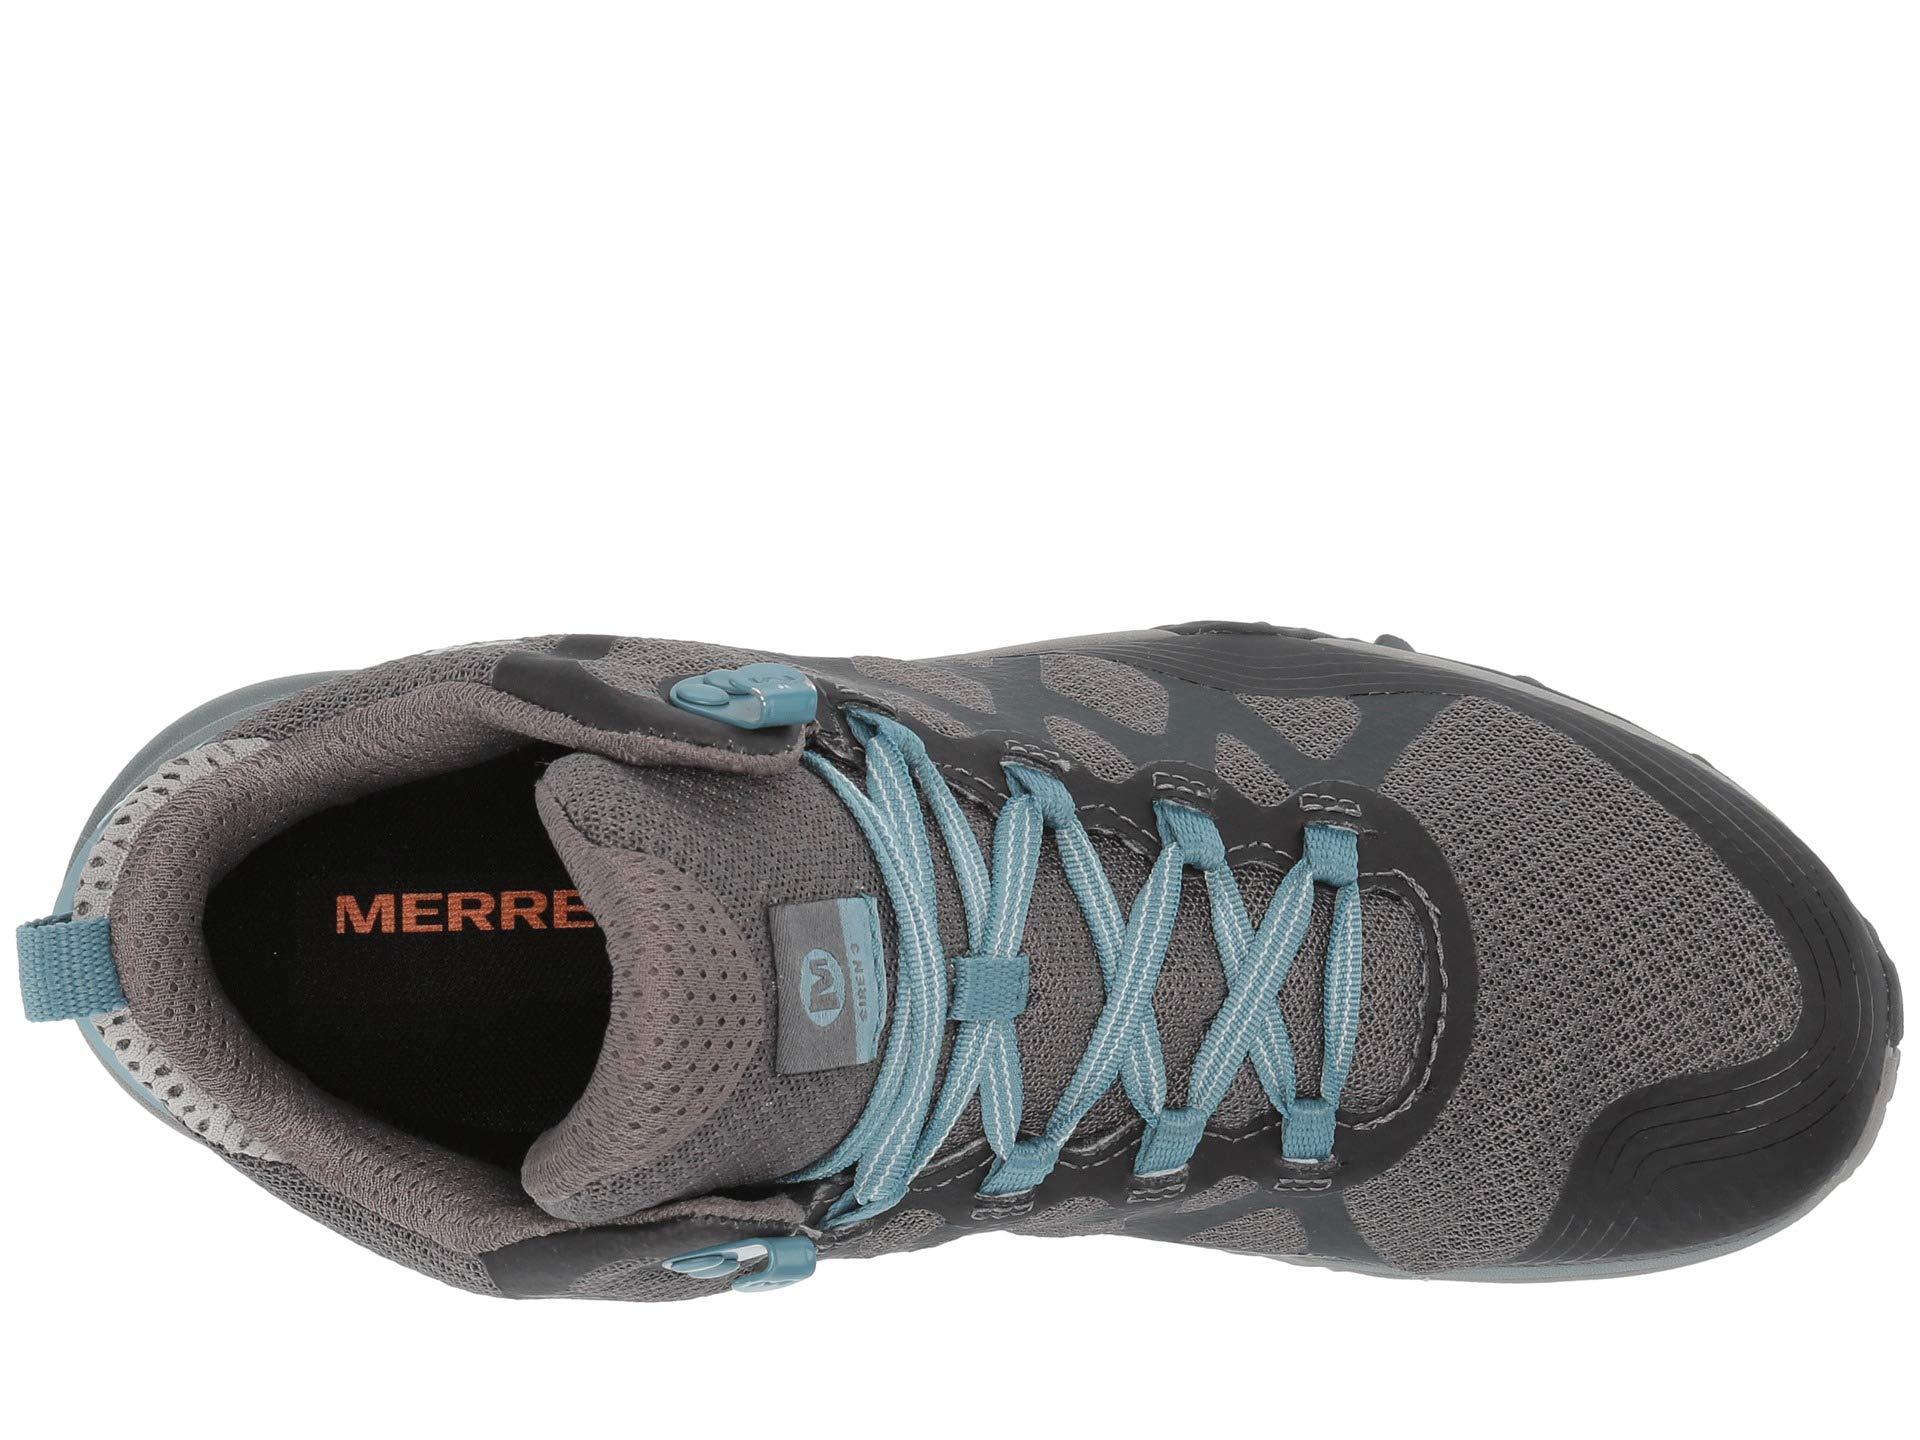 c20ad4ec626 Lyst - Merrell Siren 3 Mid Waterproof in Blue - Save 1%